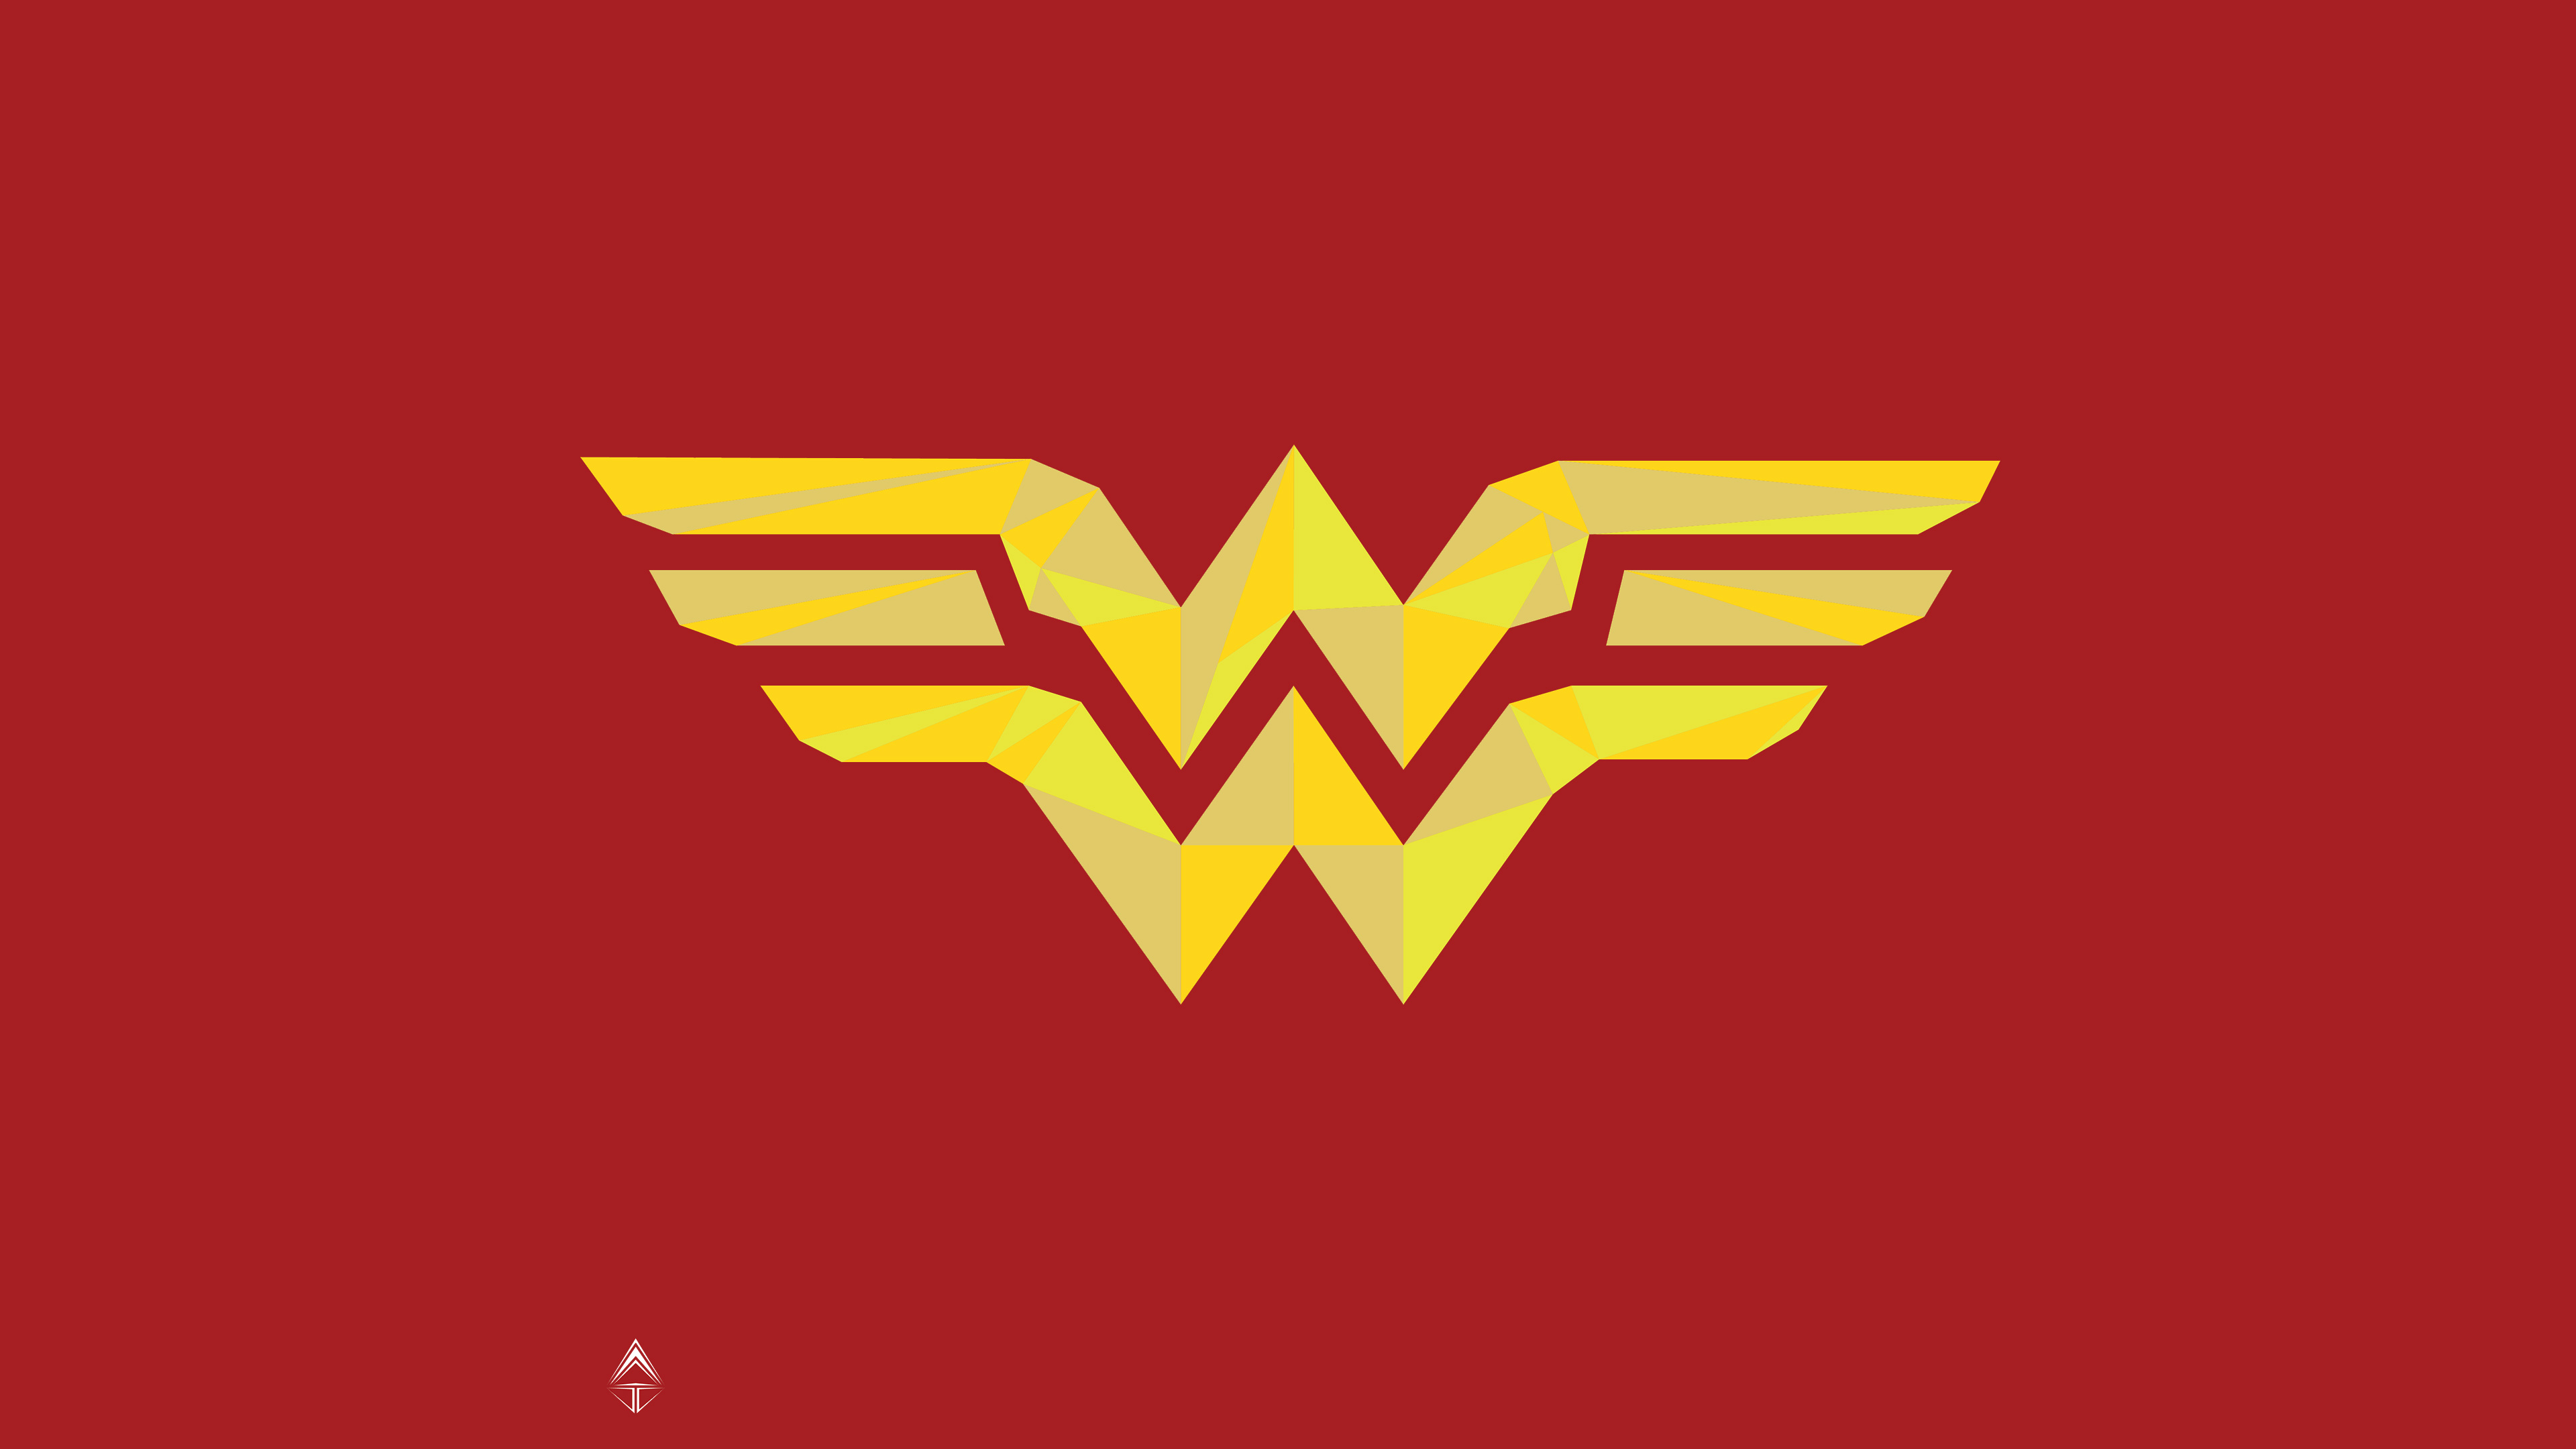 Wonder Woman Logo 4k Artwork, HD Superheroes, 4k ...